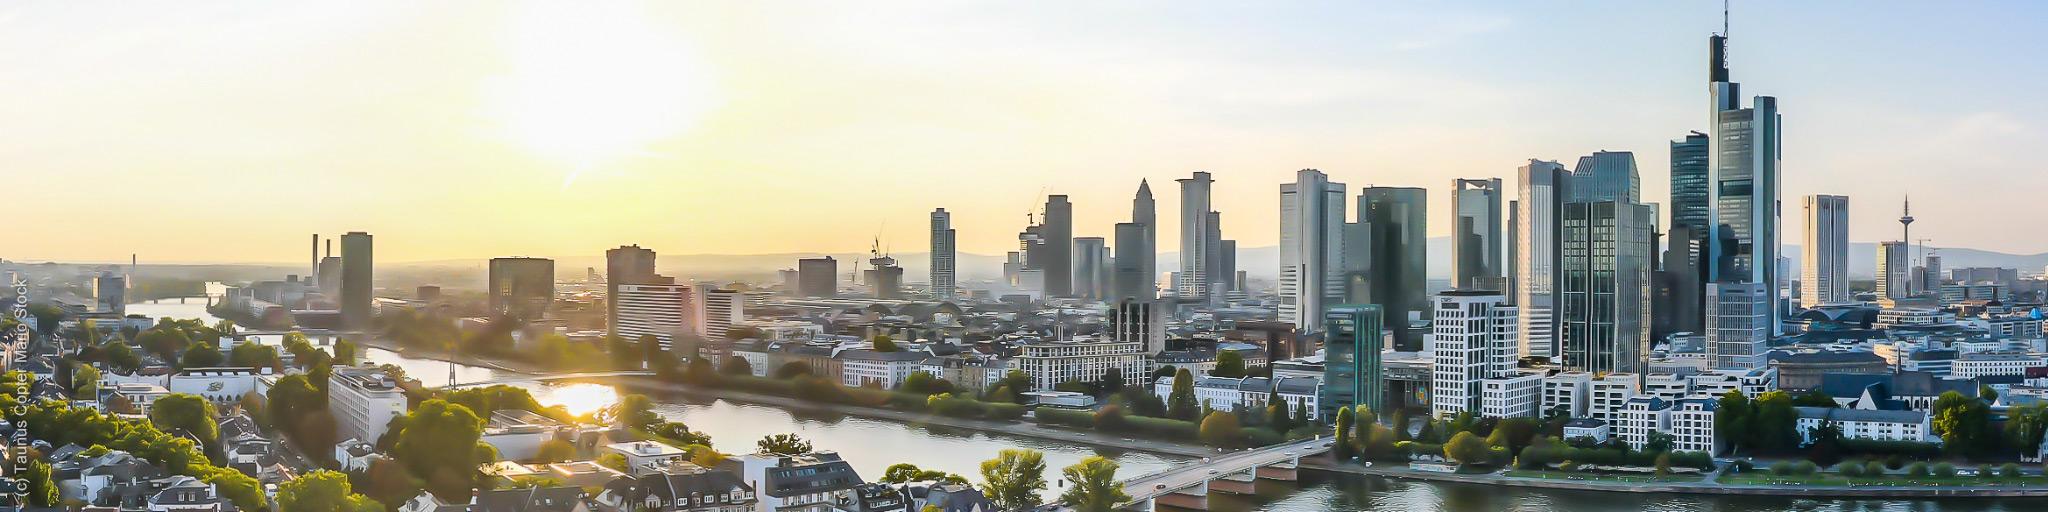 SKYLINE ATLAS - Frankfurt Panorama - Frankfurter Hochhäuser - Wolkenkratzer Ansicht - Hochhäuser - (c) Taunus Copter Mario Stock